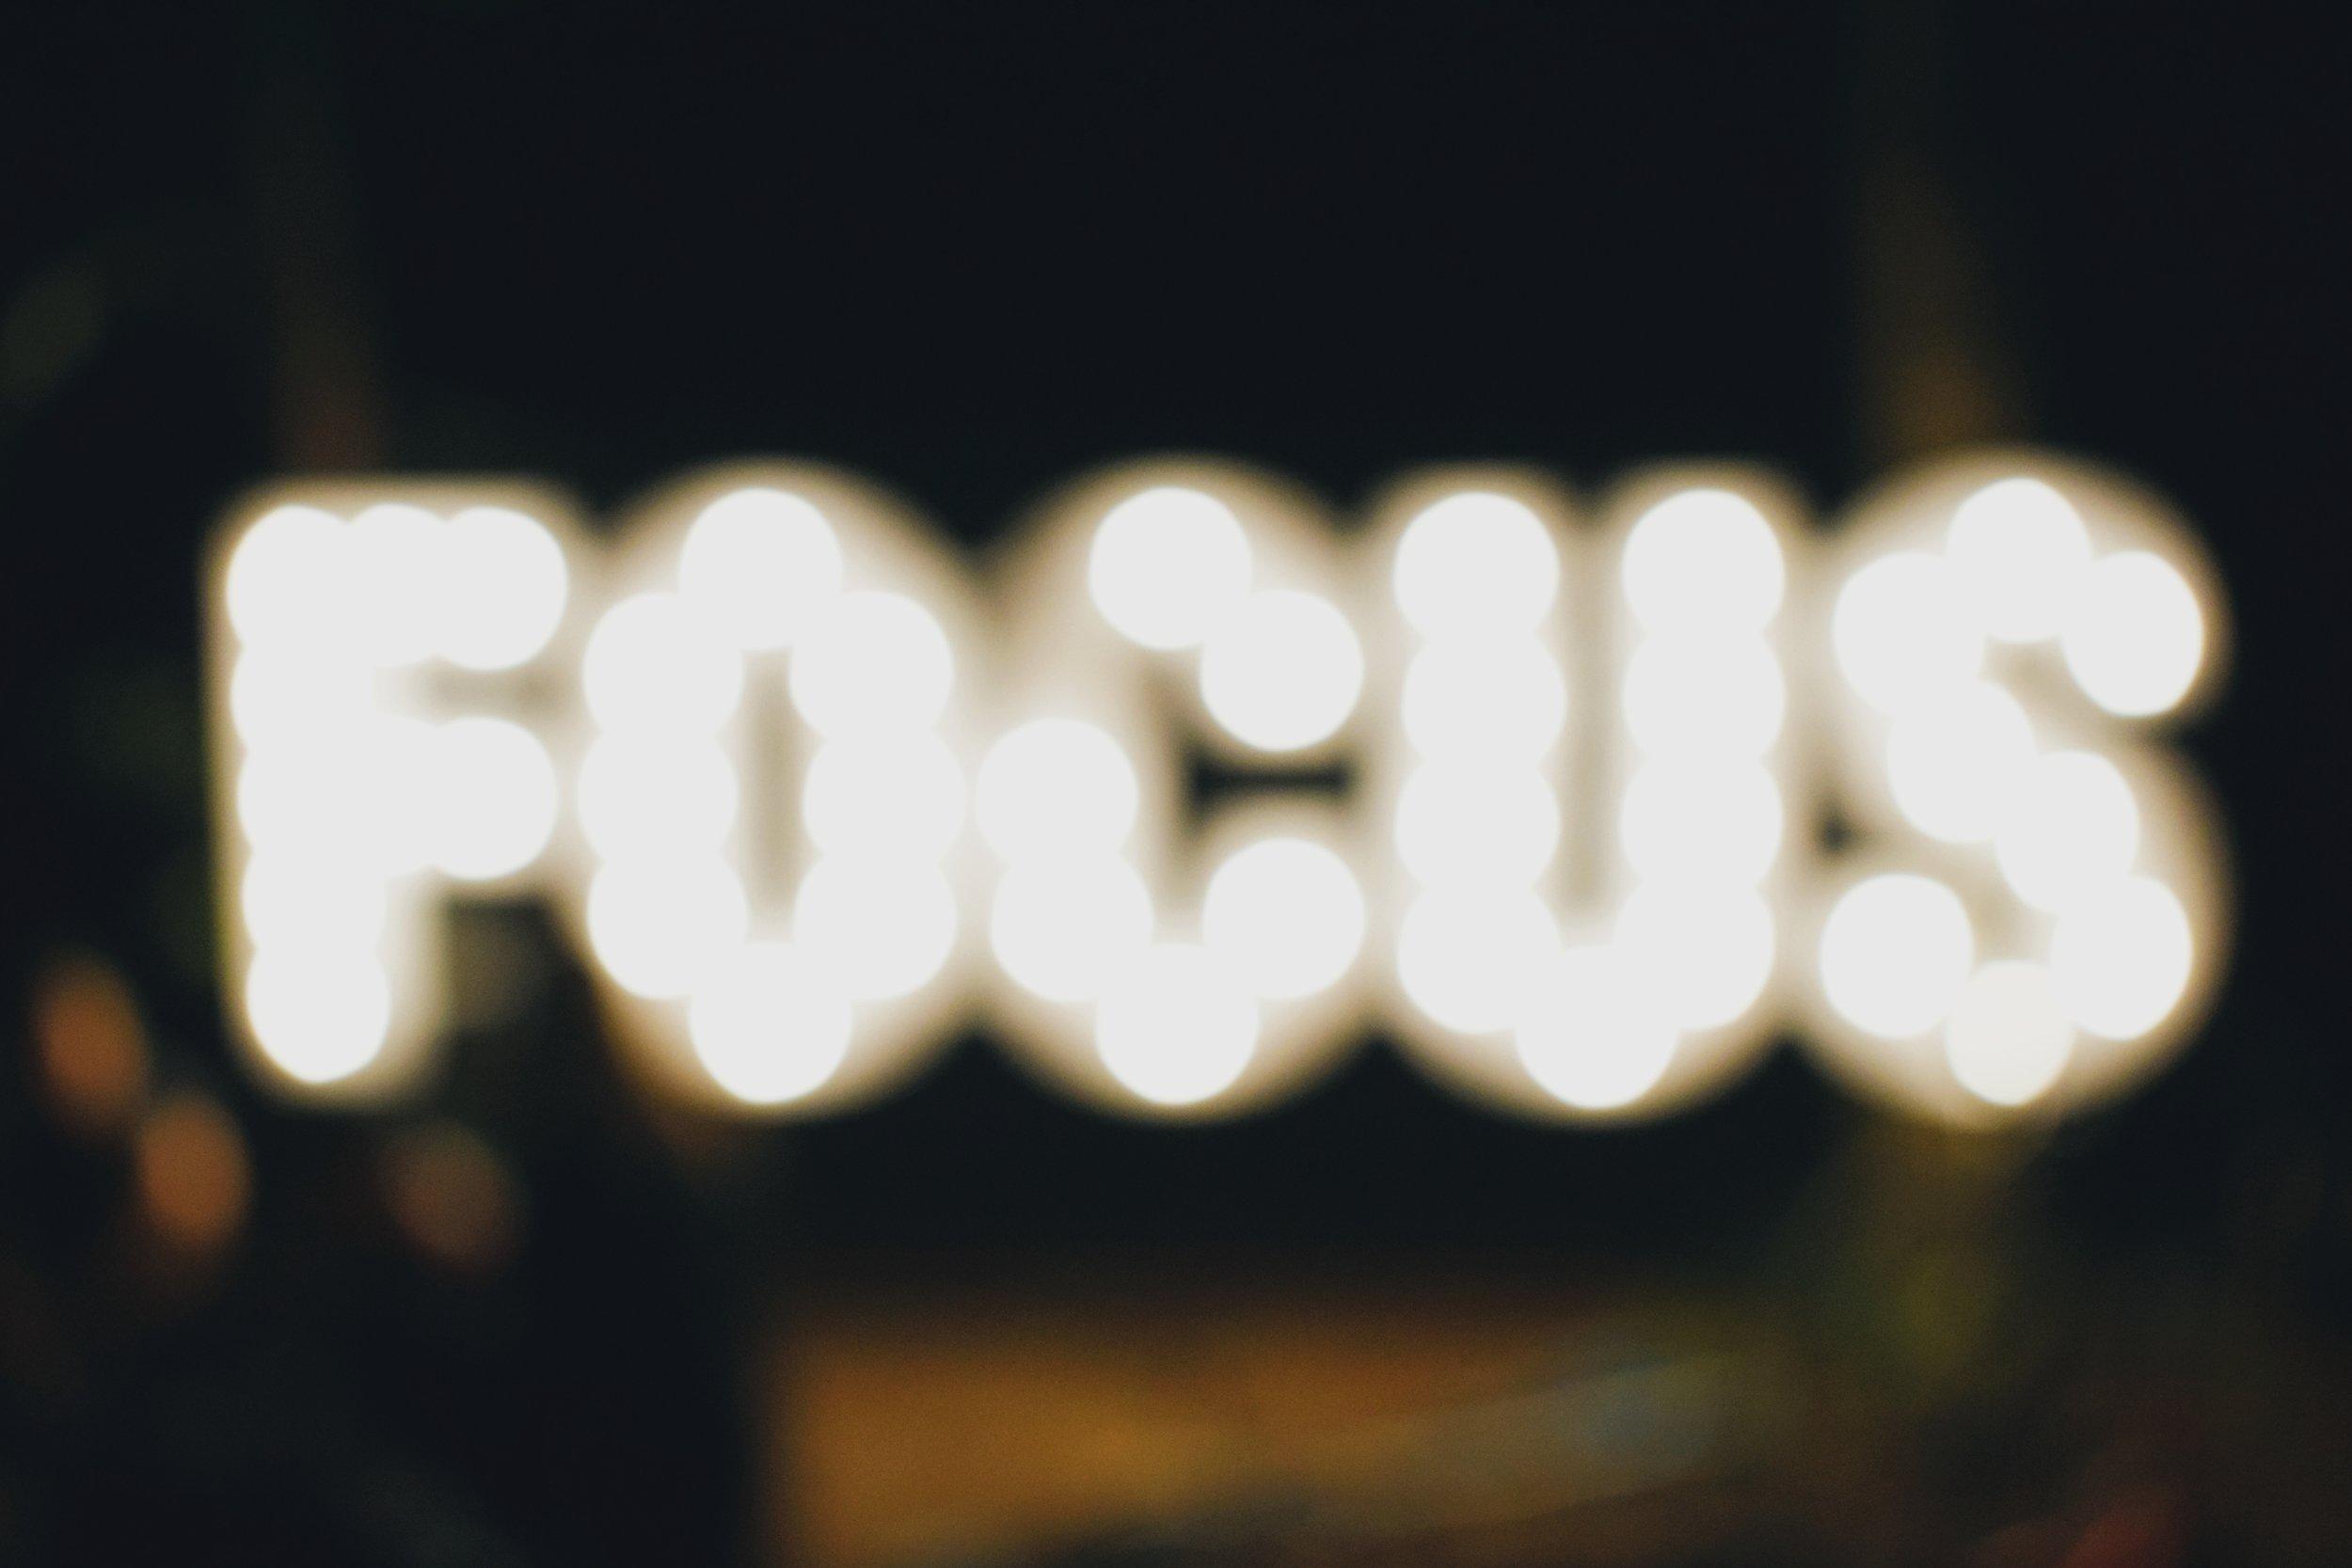 Feeling focussed